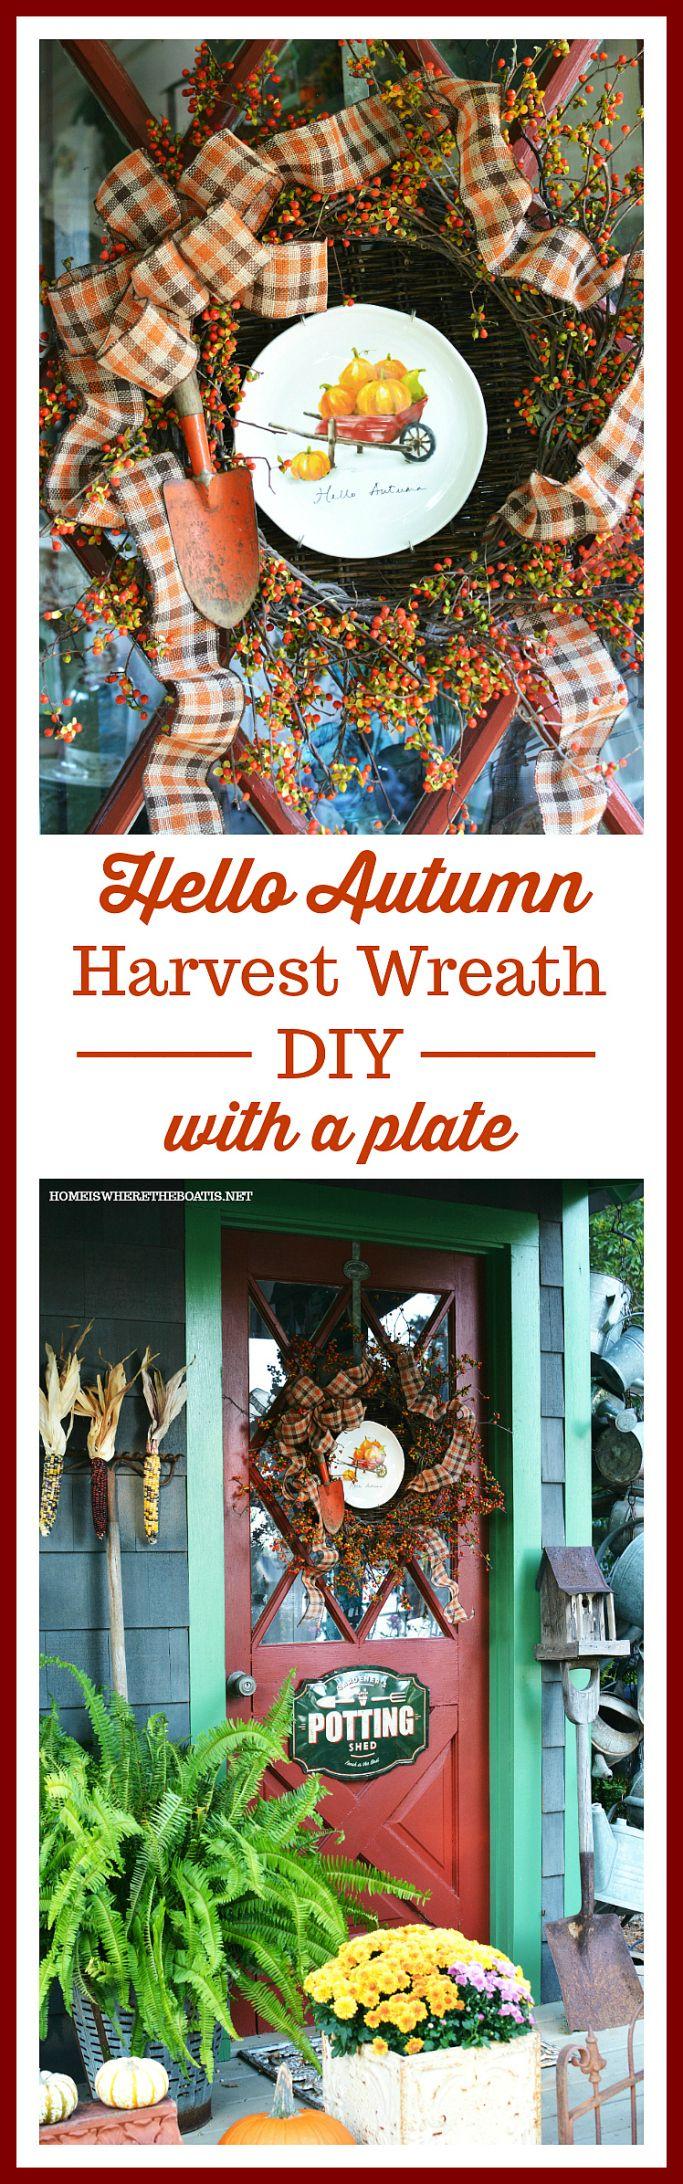 Hello Autumn Wreath and a Wheelbarrow of Pumpkins